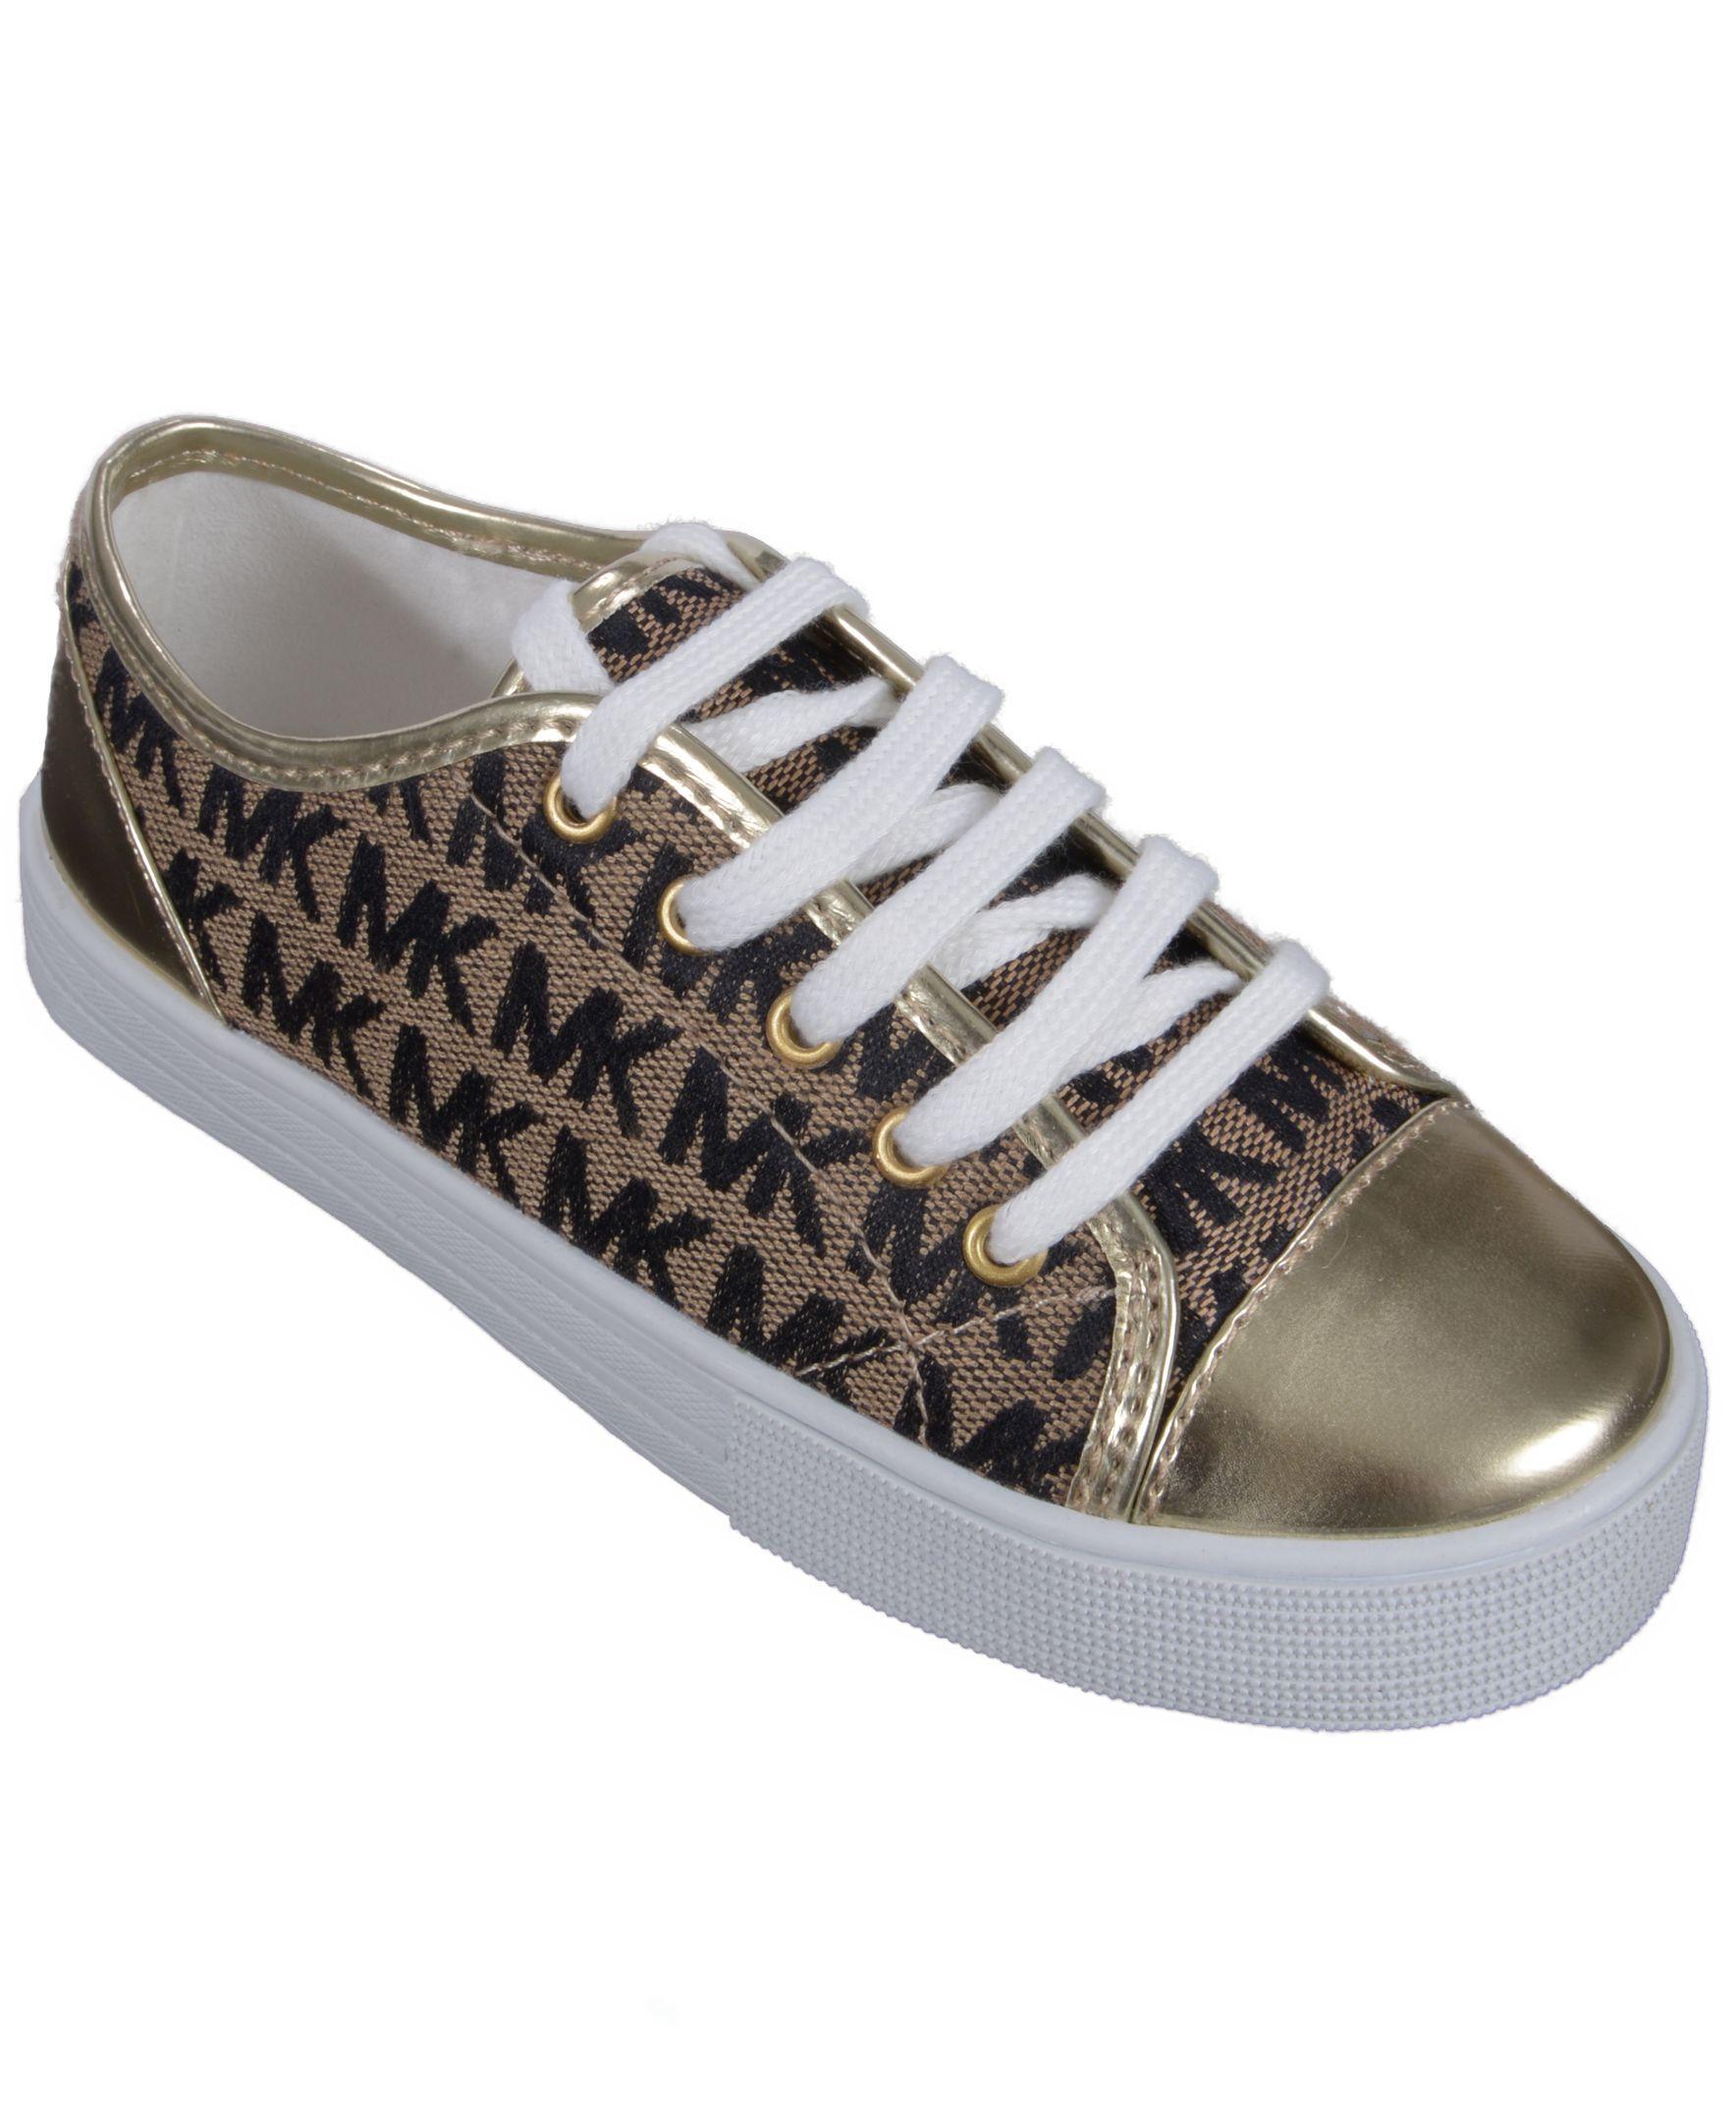 mk shoes for girl michael kors on sale